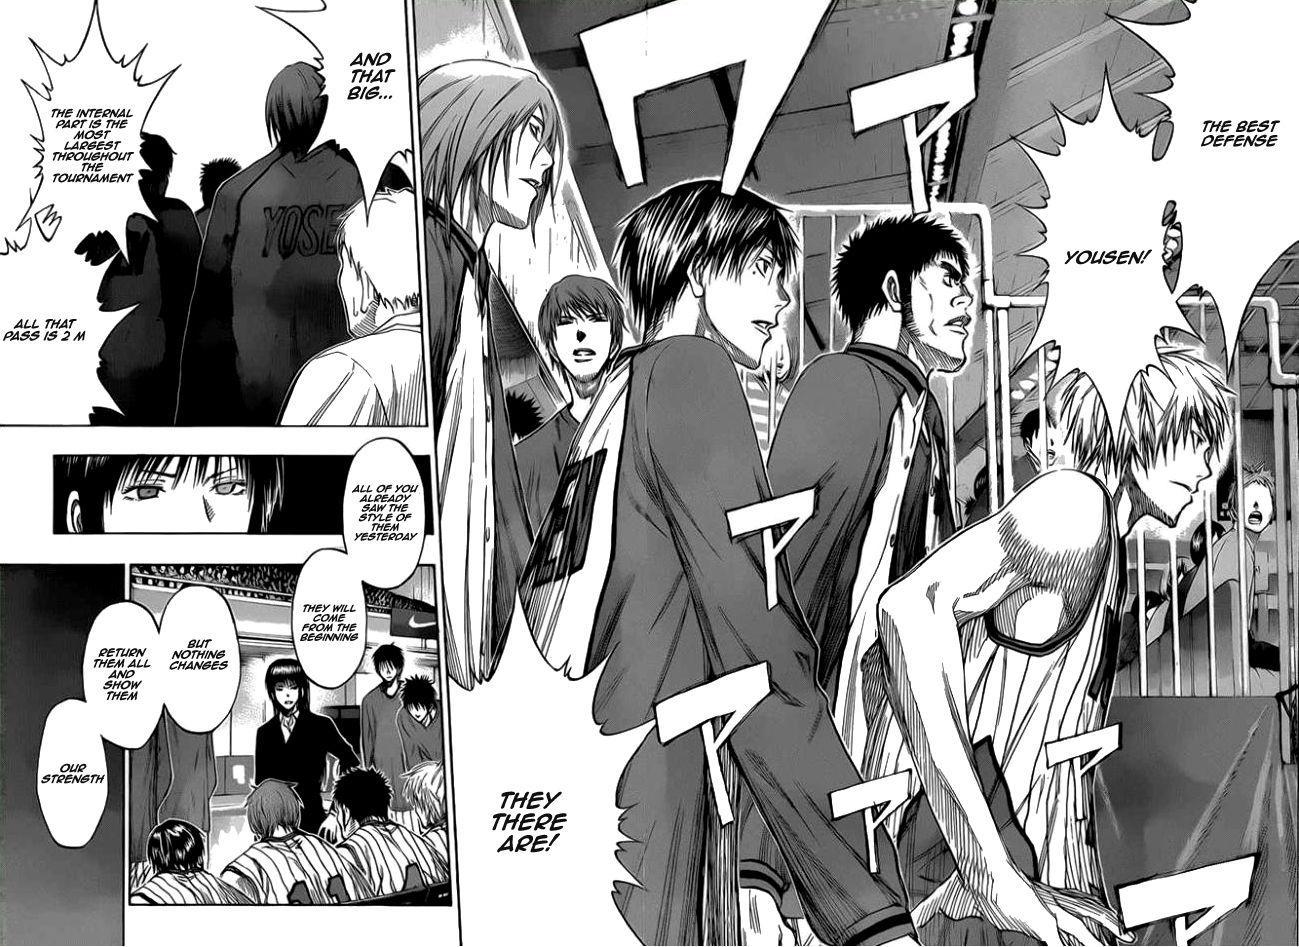 Kuroko no Basket Manga Chapter 145 - Image 10-11